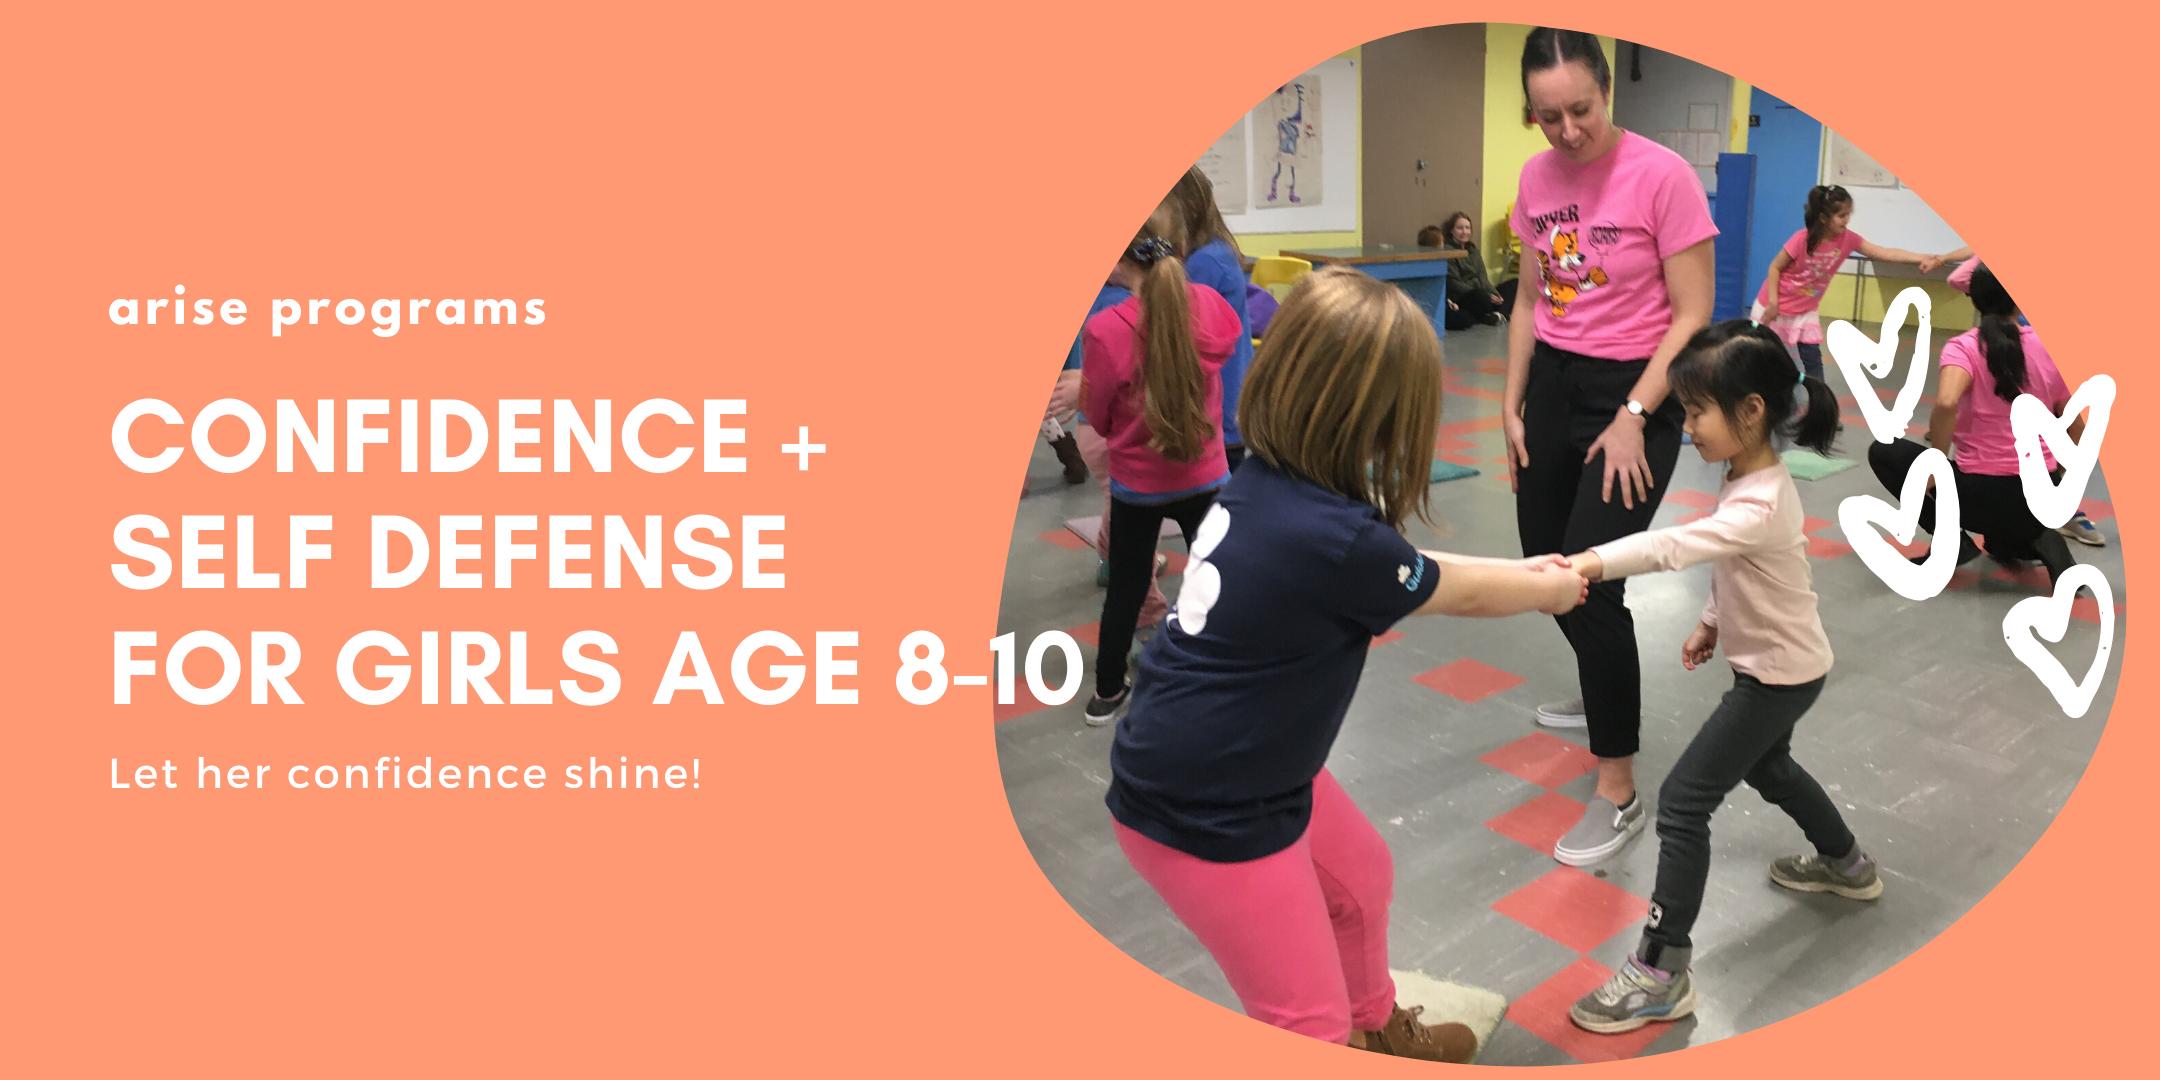 Arise Girls Age 8-10